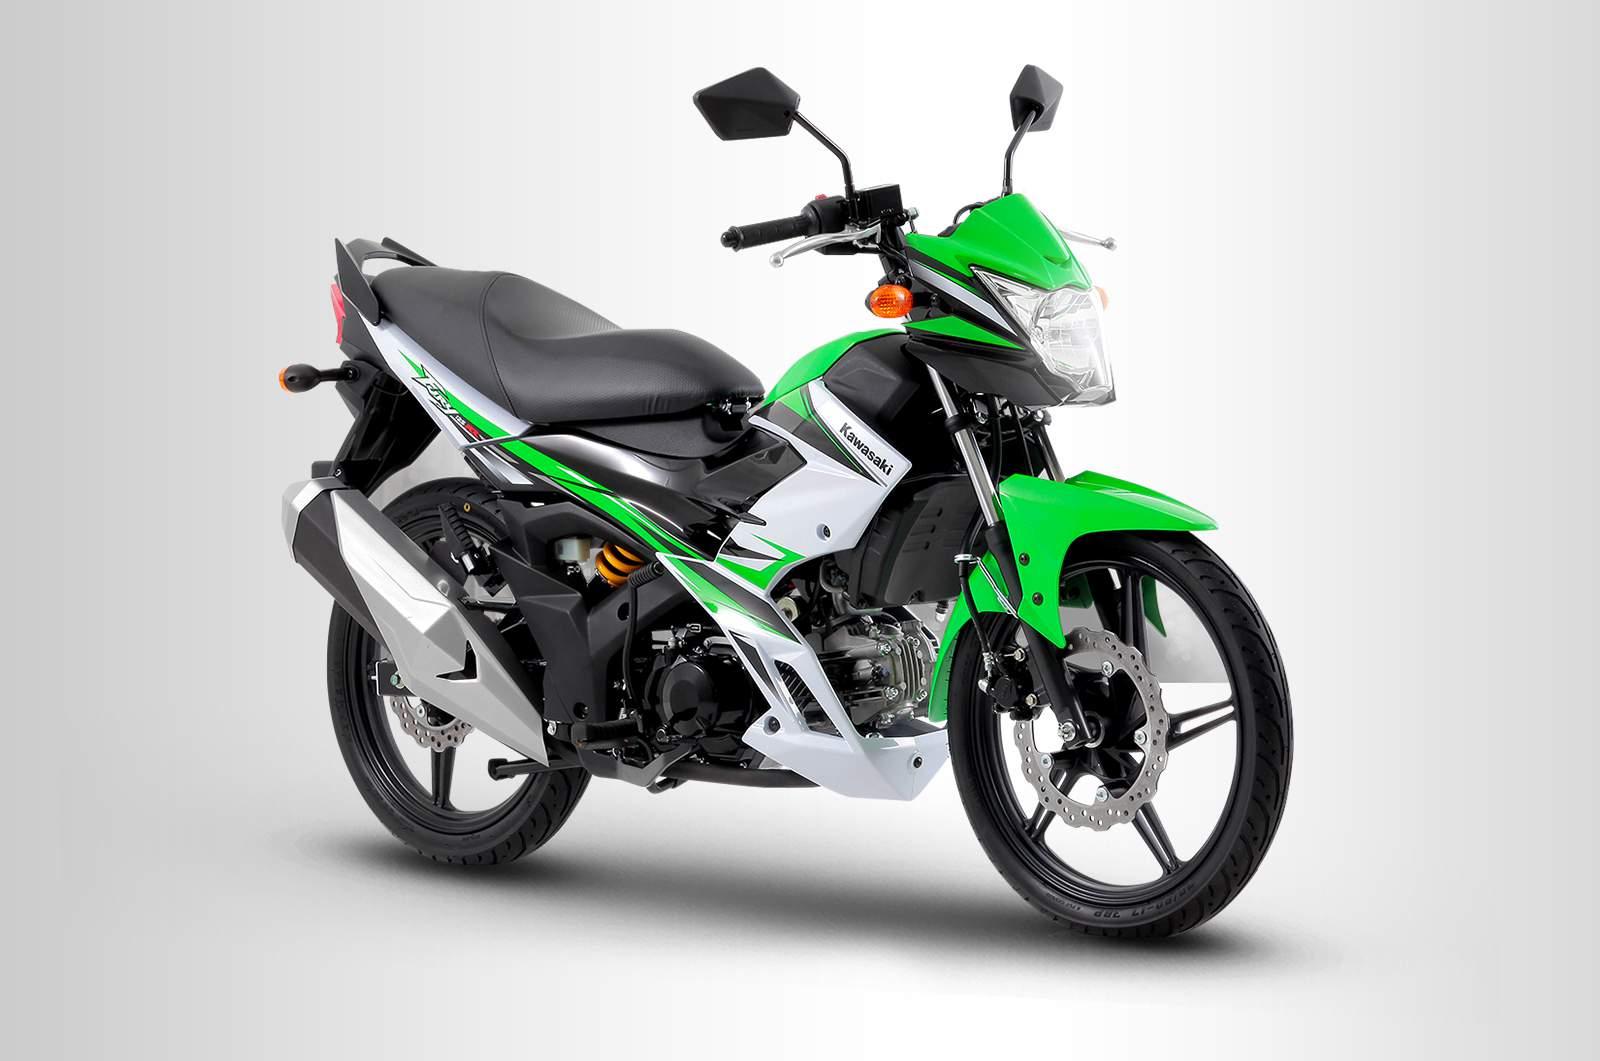 Motortrade Philippines Best Motorcycle Dealer Kawasaki Fury 125rr